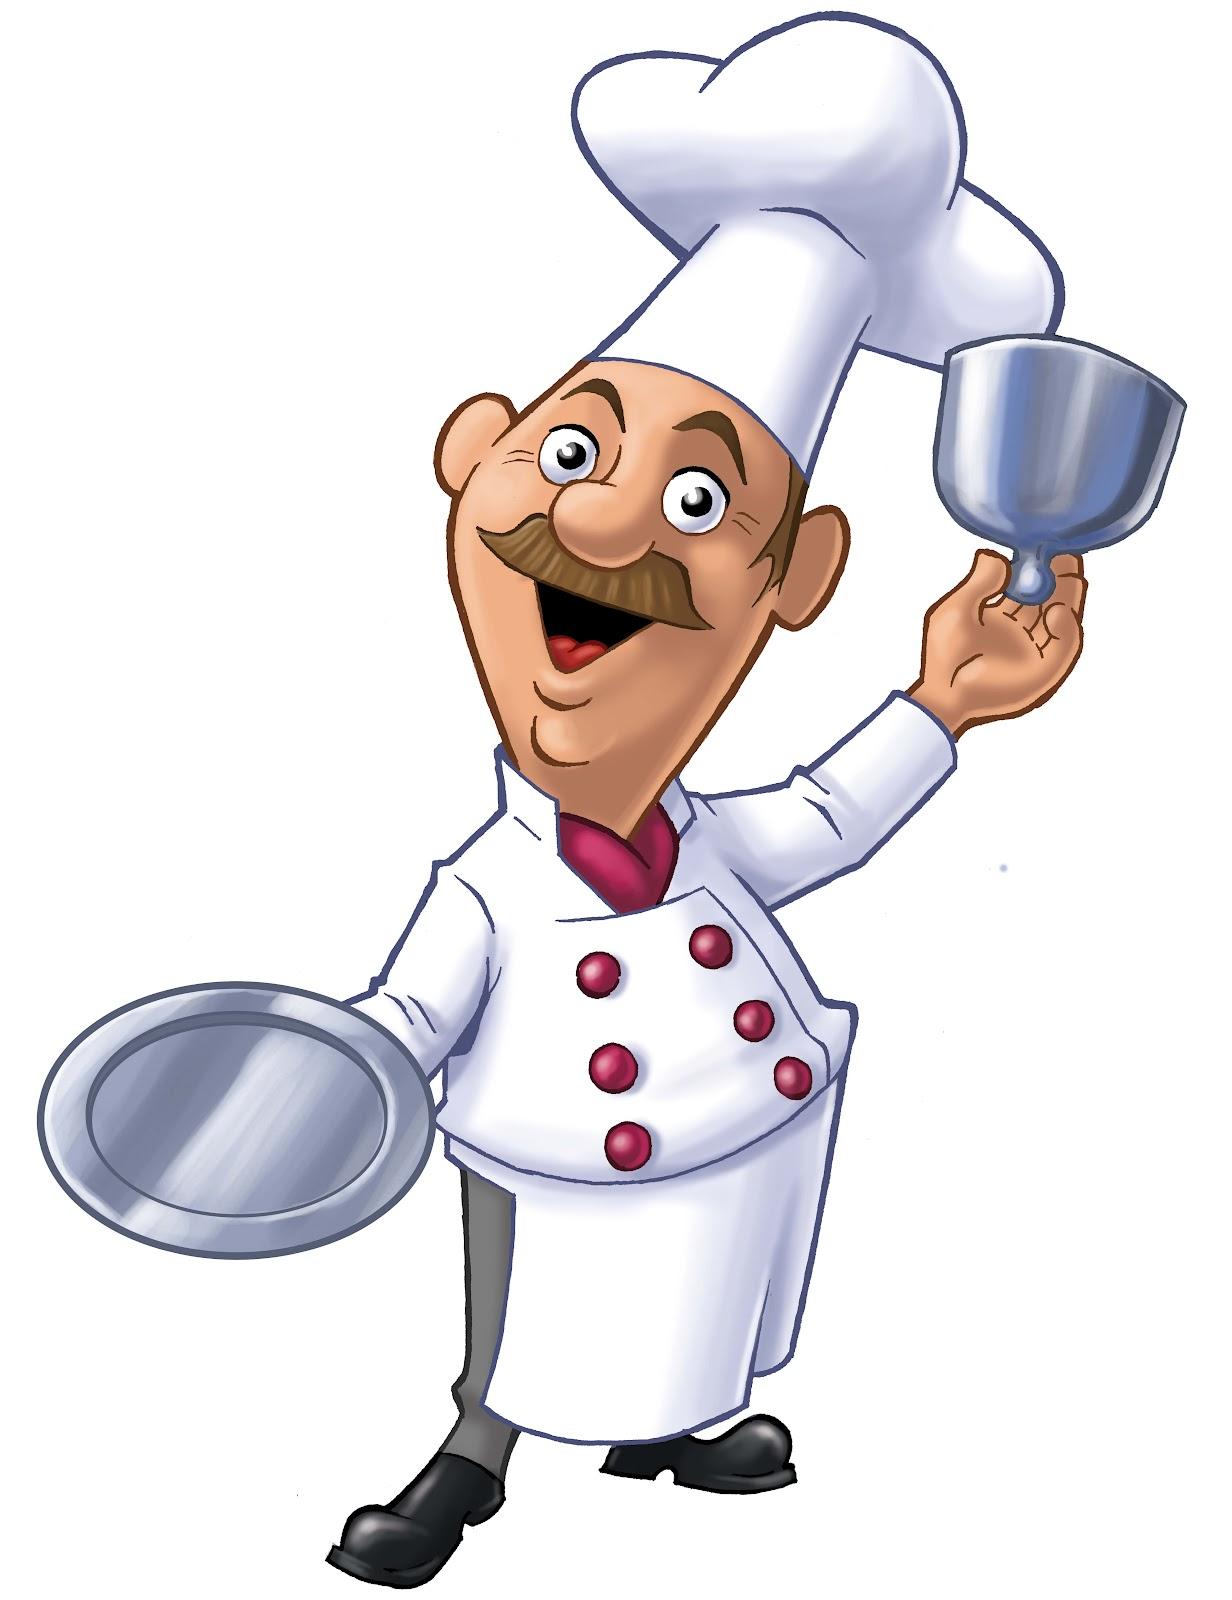 Koch bei der arbeit clipart png stock Amira | Pfadi Schöftle png stock